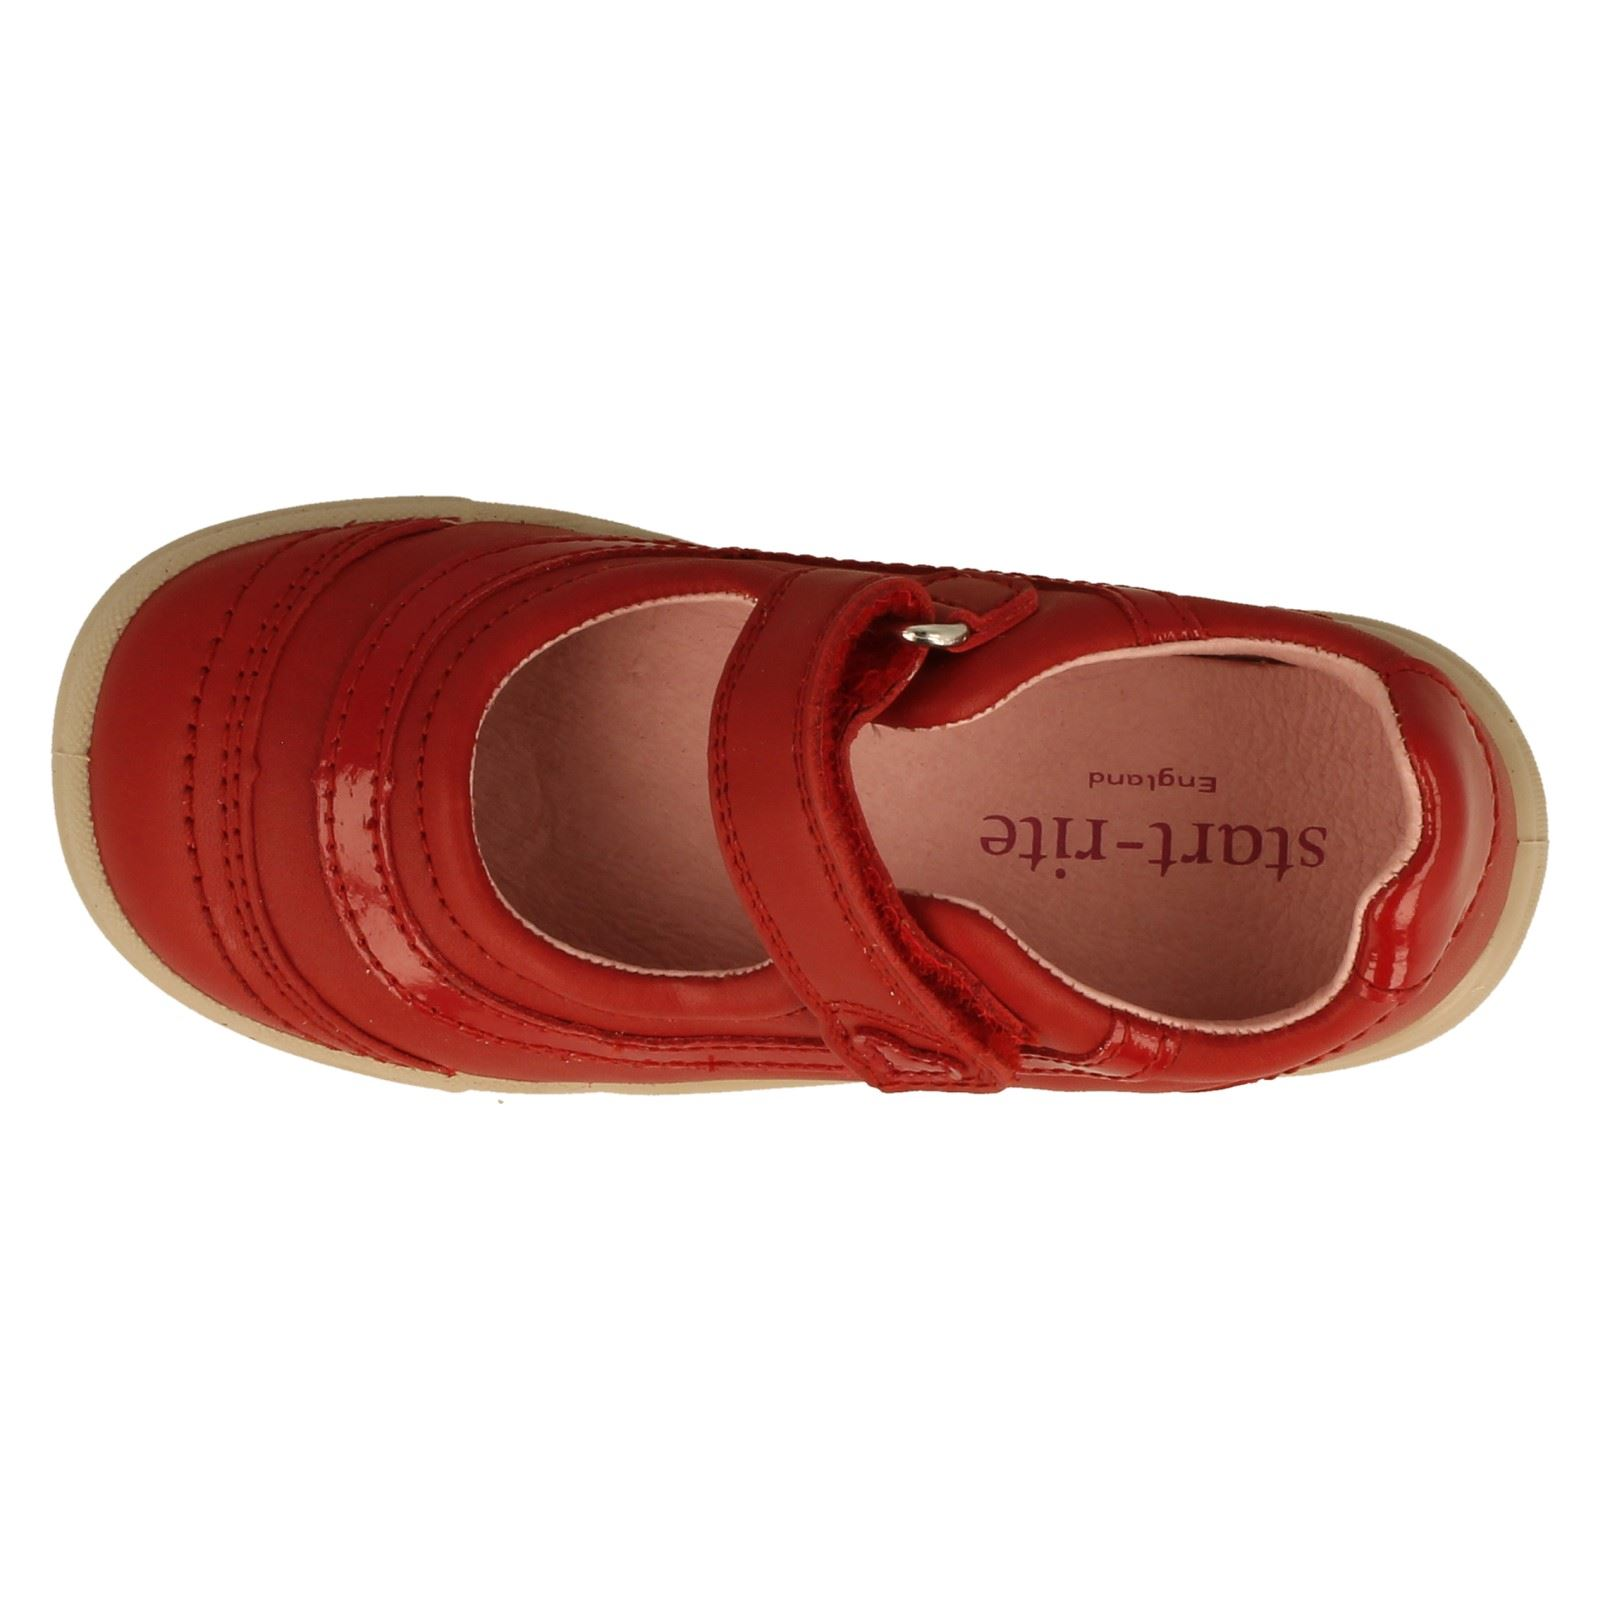 Chicas START Rite Informal Zapatos Etiqueta FLEXY-plumas suaves-W